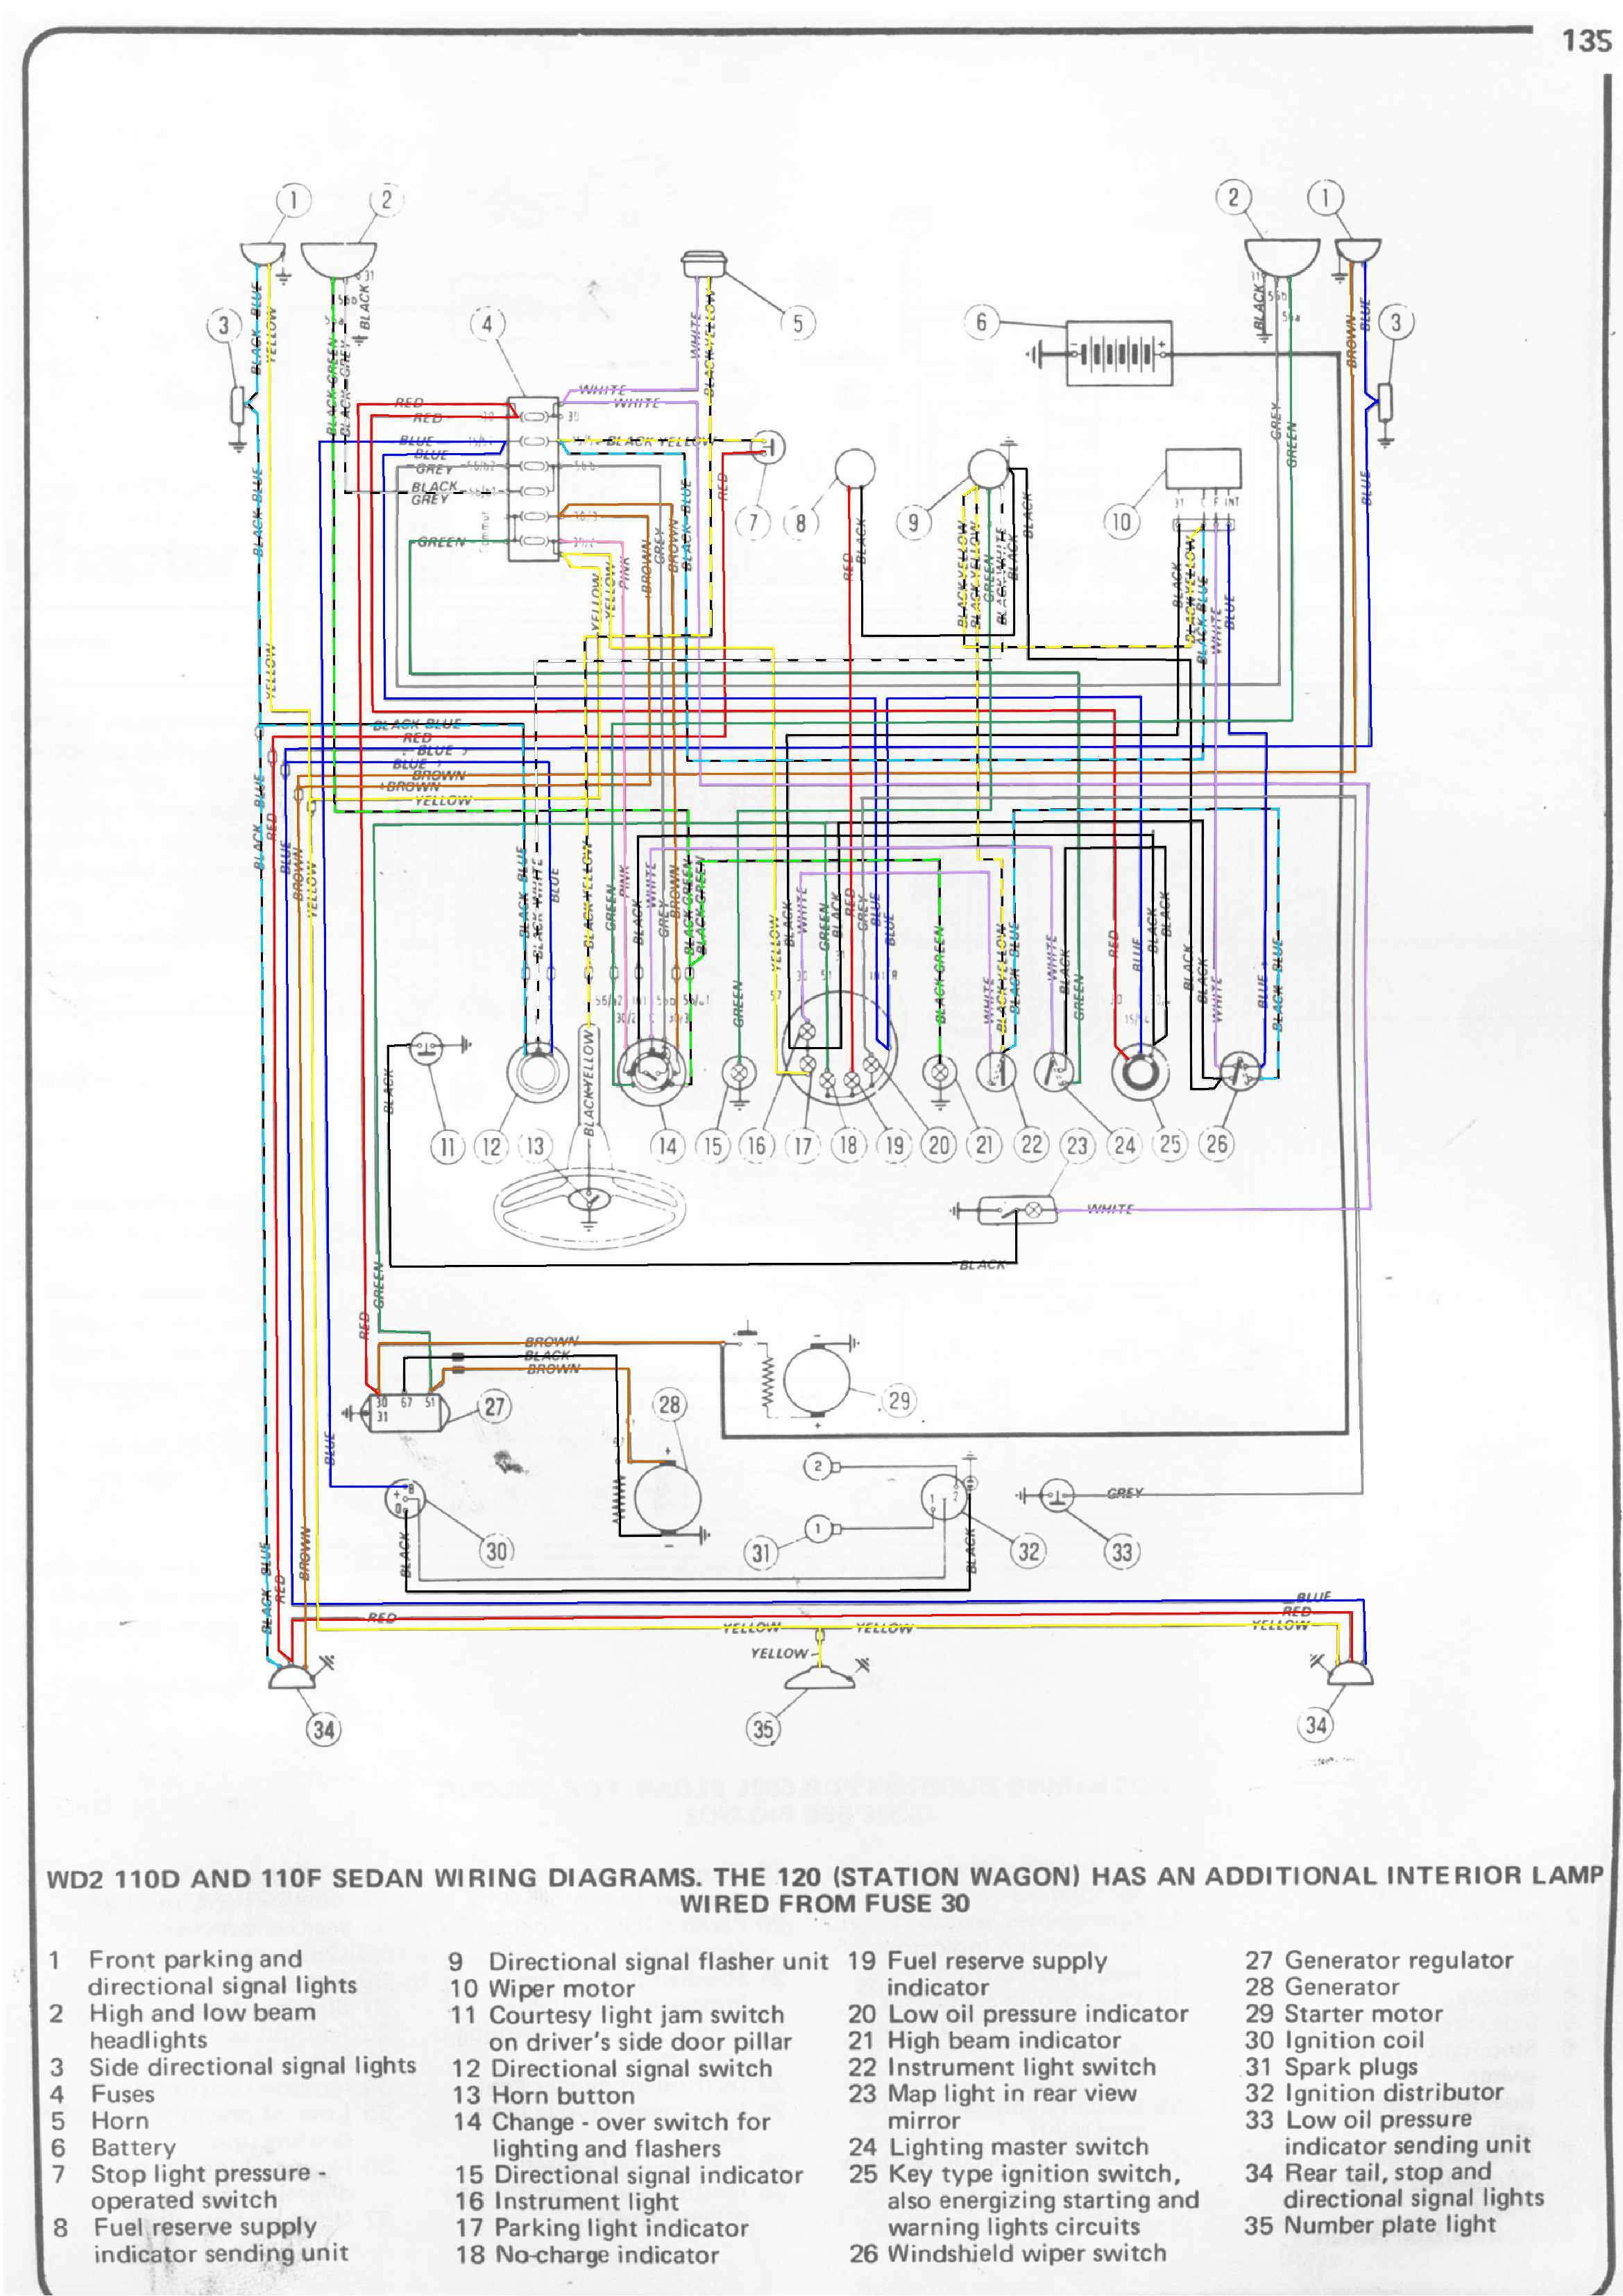 Fiat 600 Wiring Diagram Pdf | Wiring Diagram Fiat Tractor Wiring Diagram on fiat 600 tractor, polaris 600 wiring diagram, ktm 600 wiring diagram, fiat 600 engine, fiat 600 steering diagram, fiat spider wiring diagram, fiat 124 wiring diagram, fiat multipla wiring diagram, ford 600 wiring diagram, fiat 600 seats, bobcat 600 wiring diagram, fiat uno wiring diagram, fiat 500 wiring diagram, fiat 600 cylinder head, fiat 600 parts, fiat 600 oil filter, fiat ducato wiring diagram,